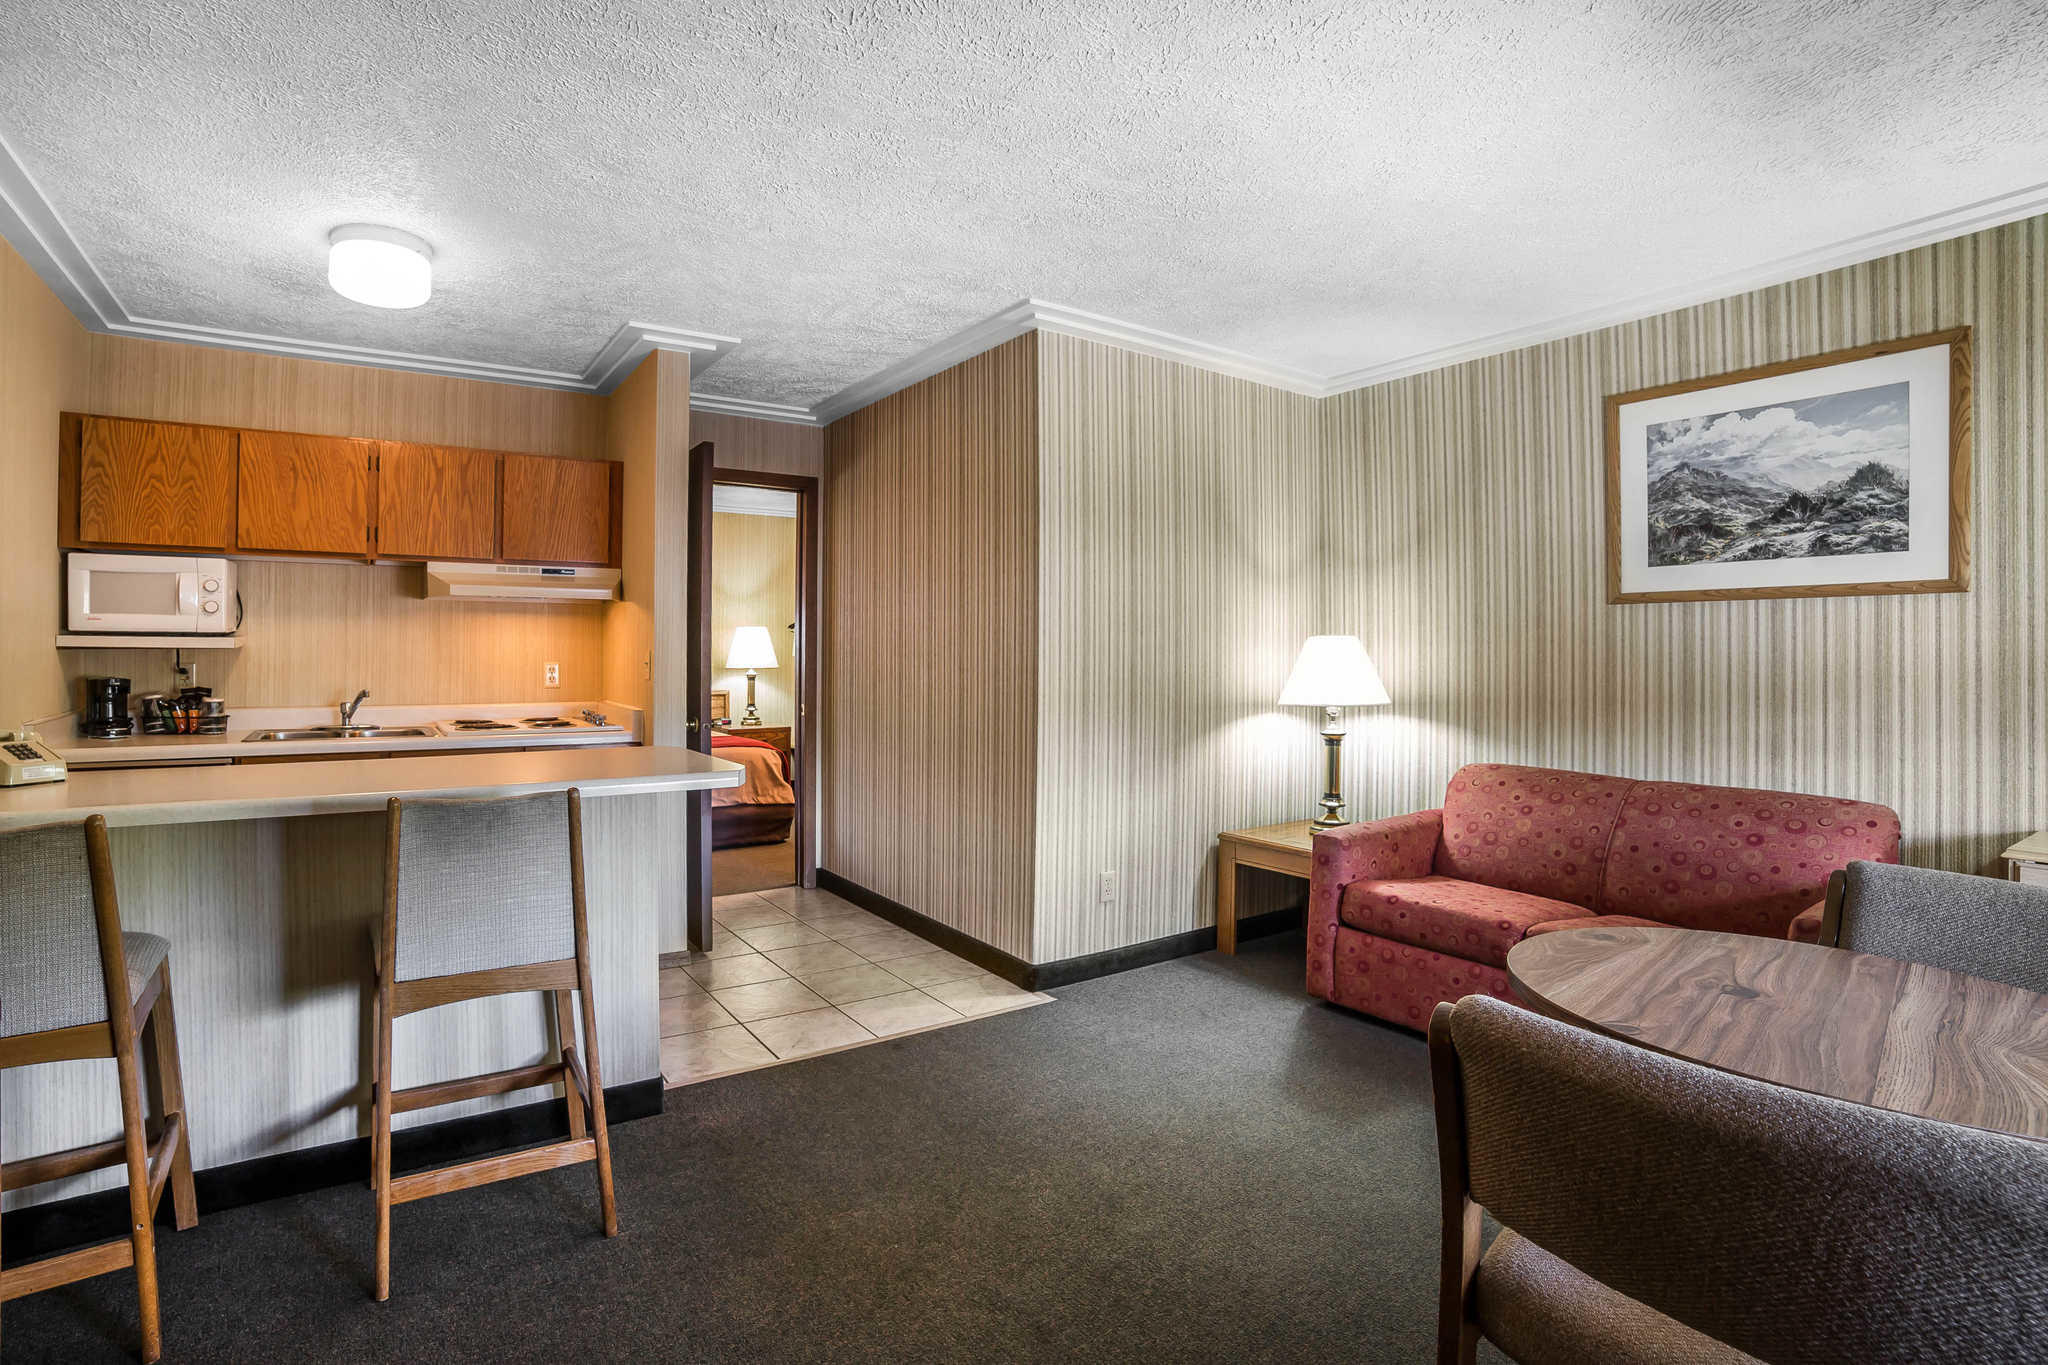 Rodeway Inn Pronghorn Lodge image 15